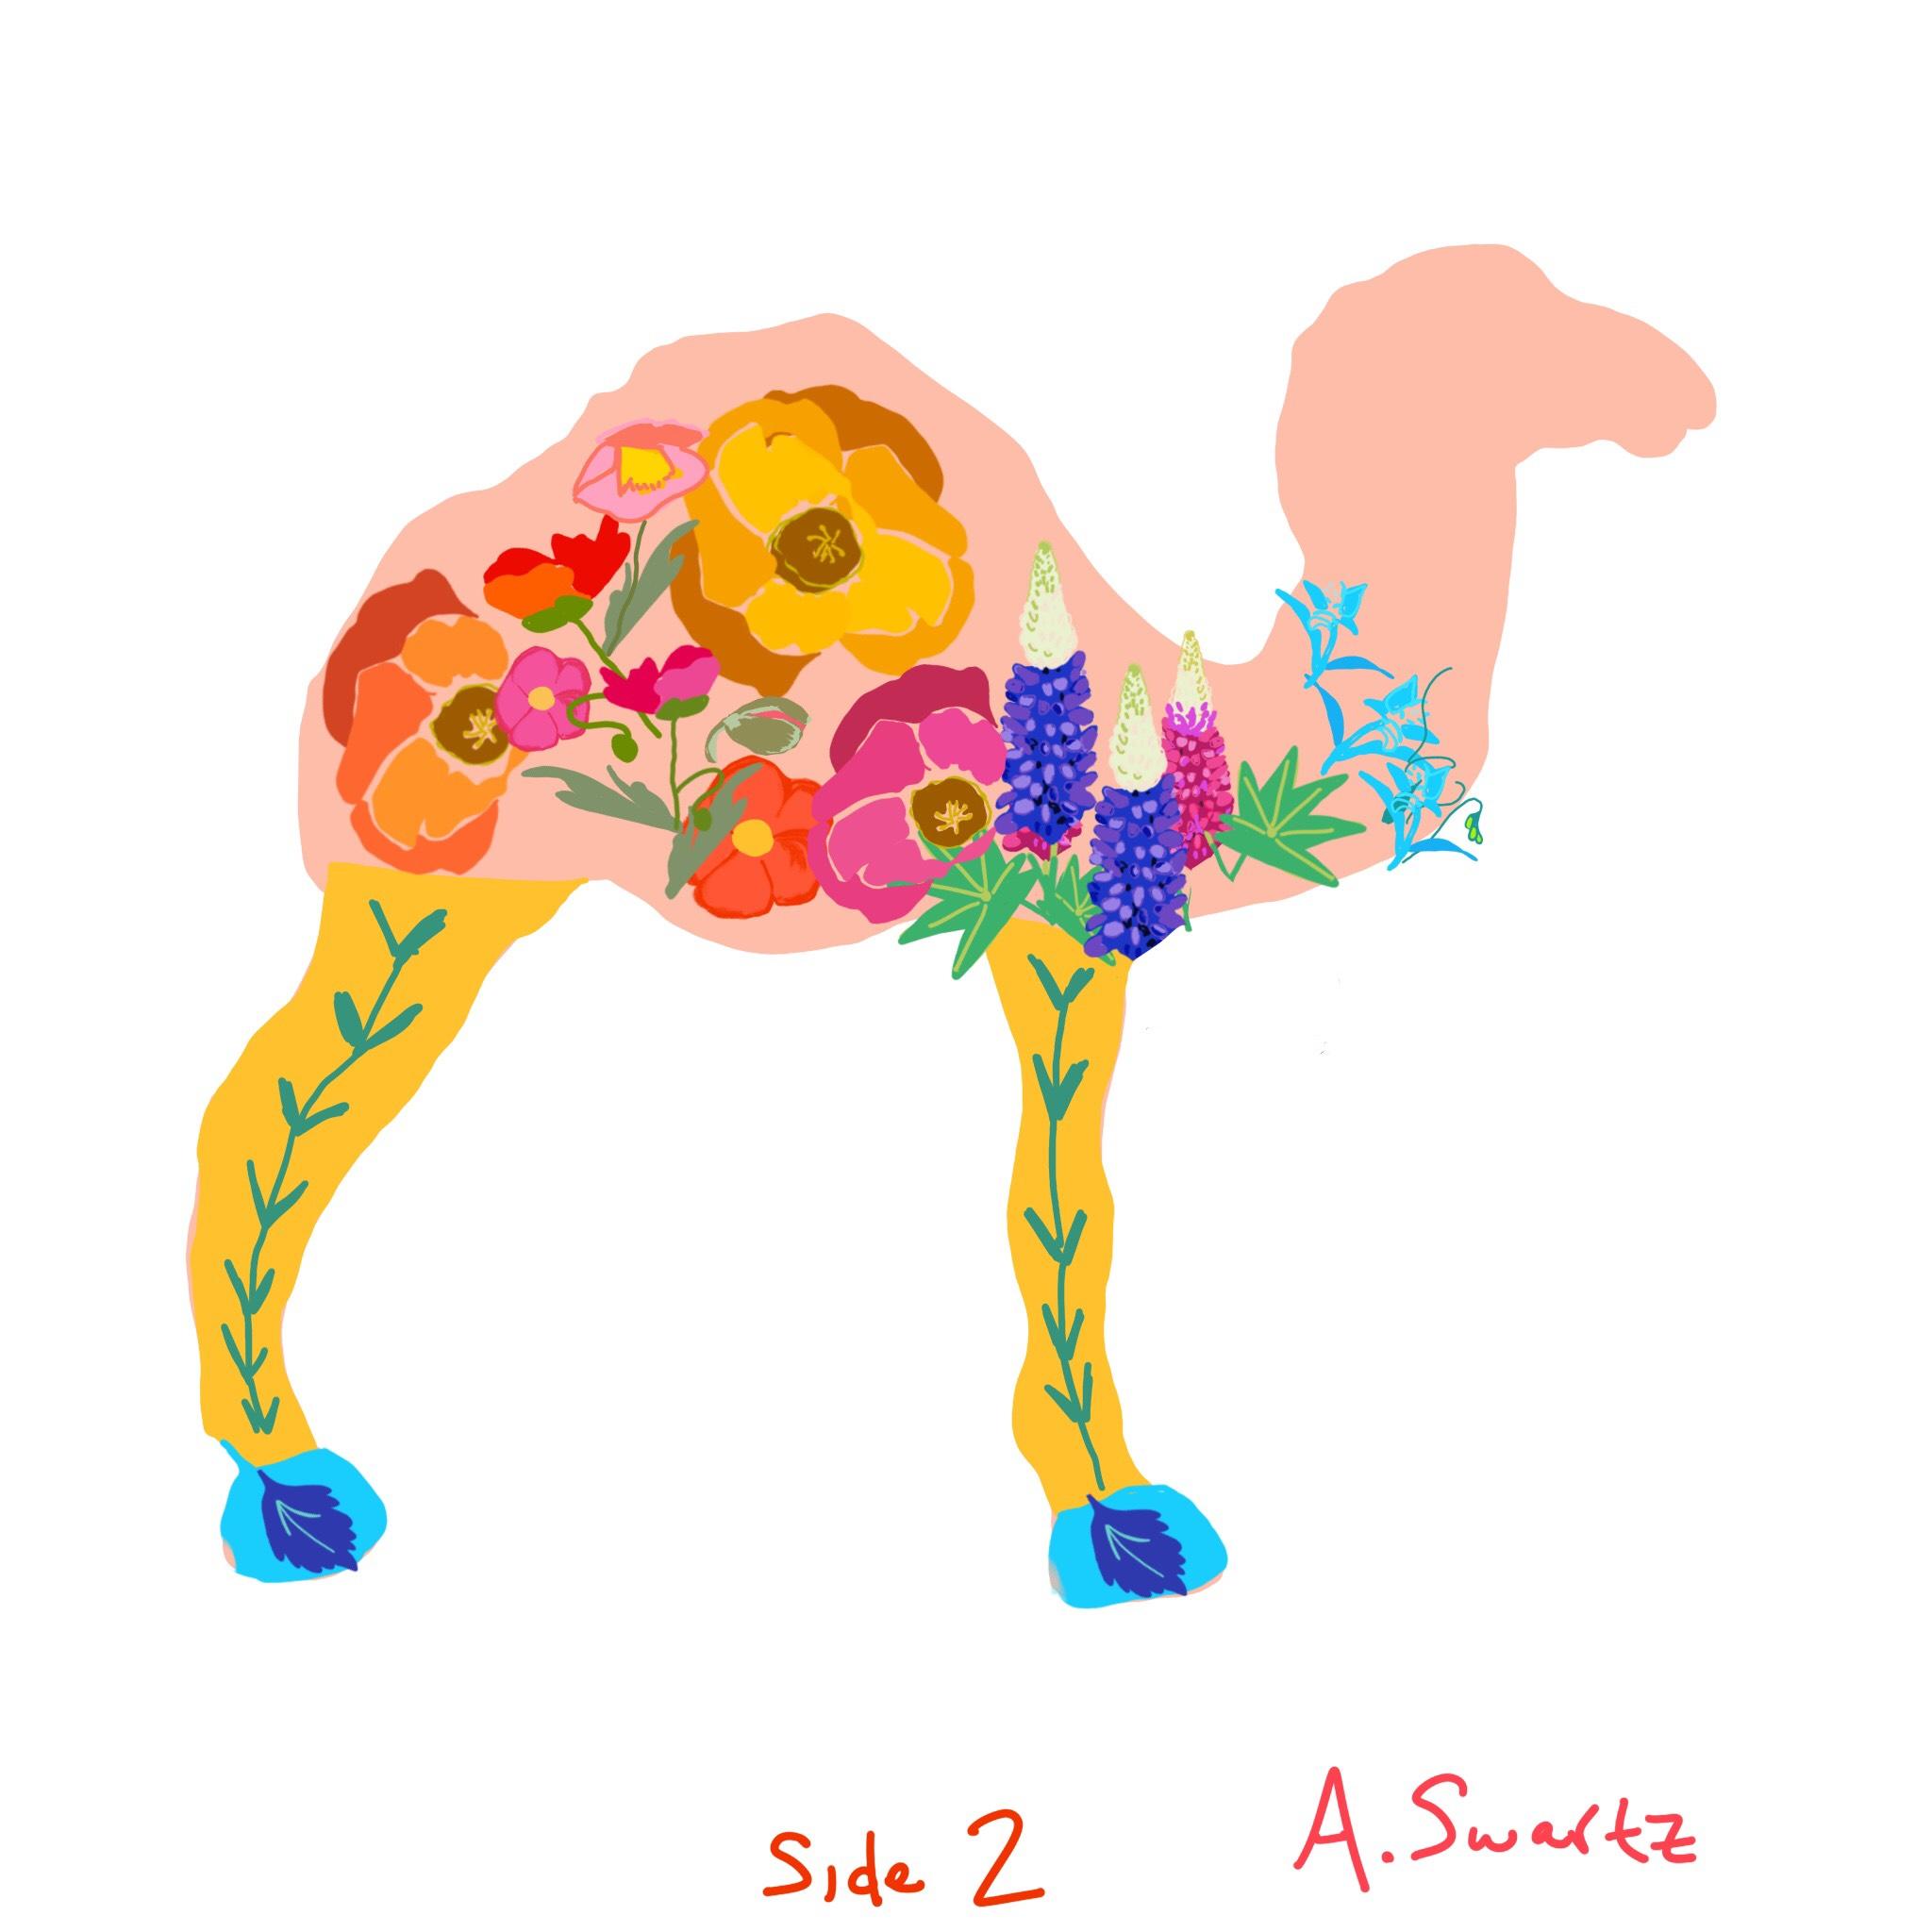 A.Swartz.Camel.Sketch.2.jpg